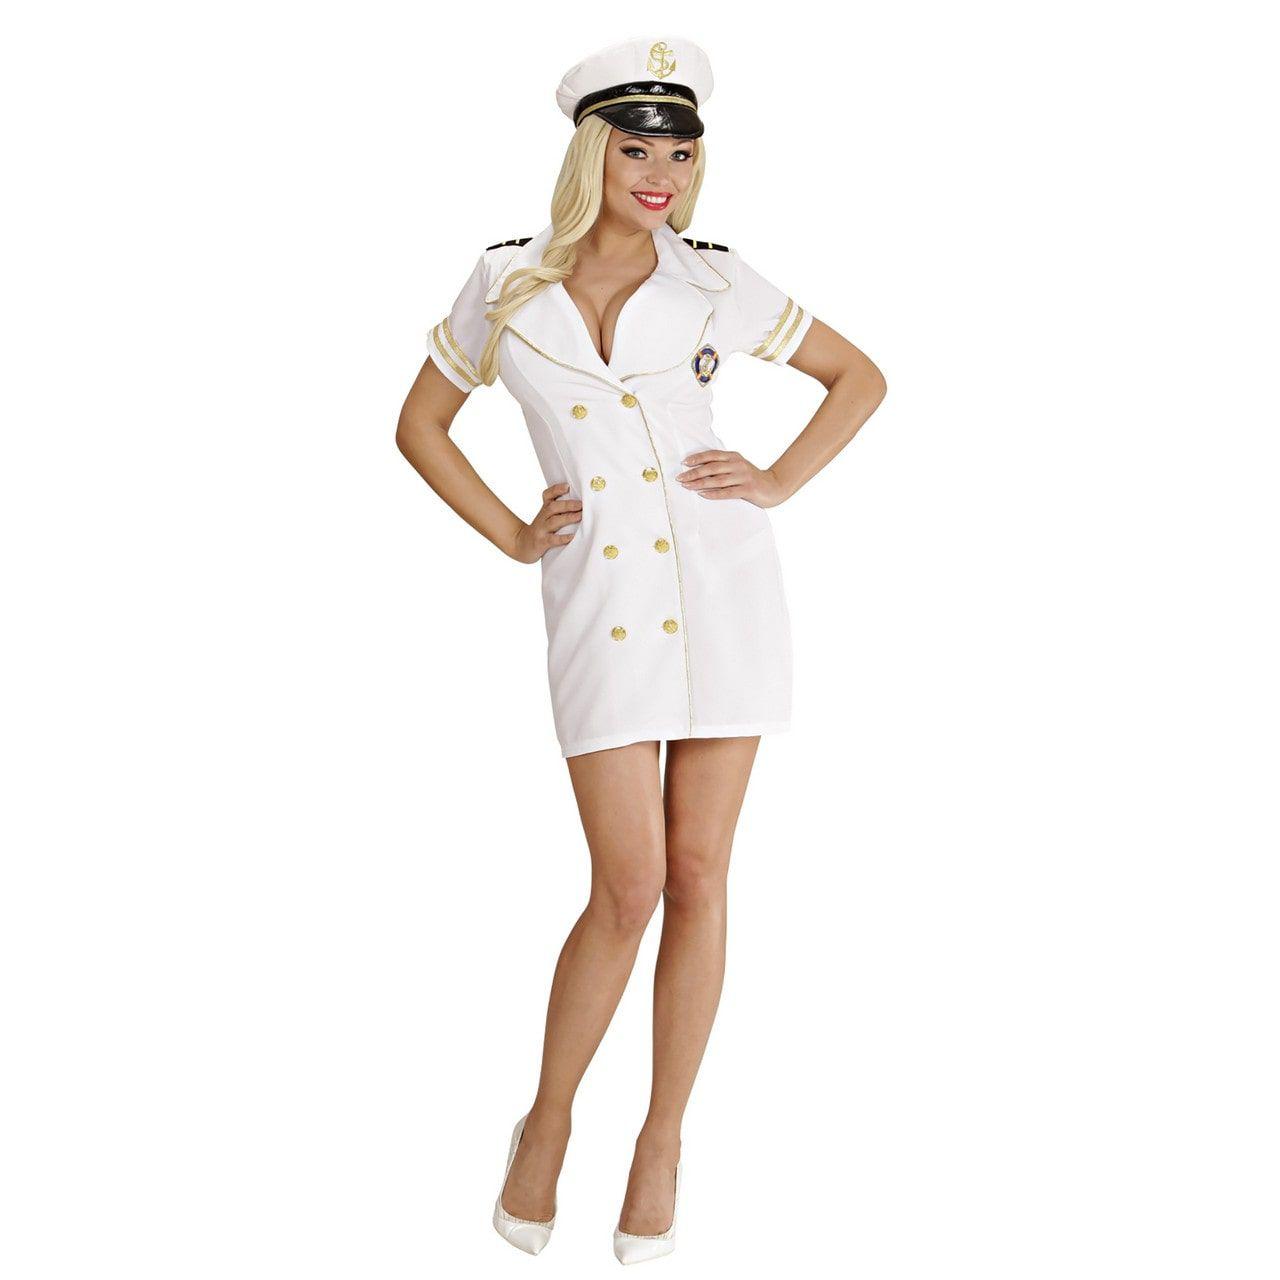 Ay- Ay Vrouwelijke Kapitein Kostuum